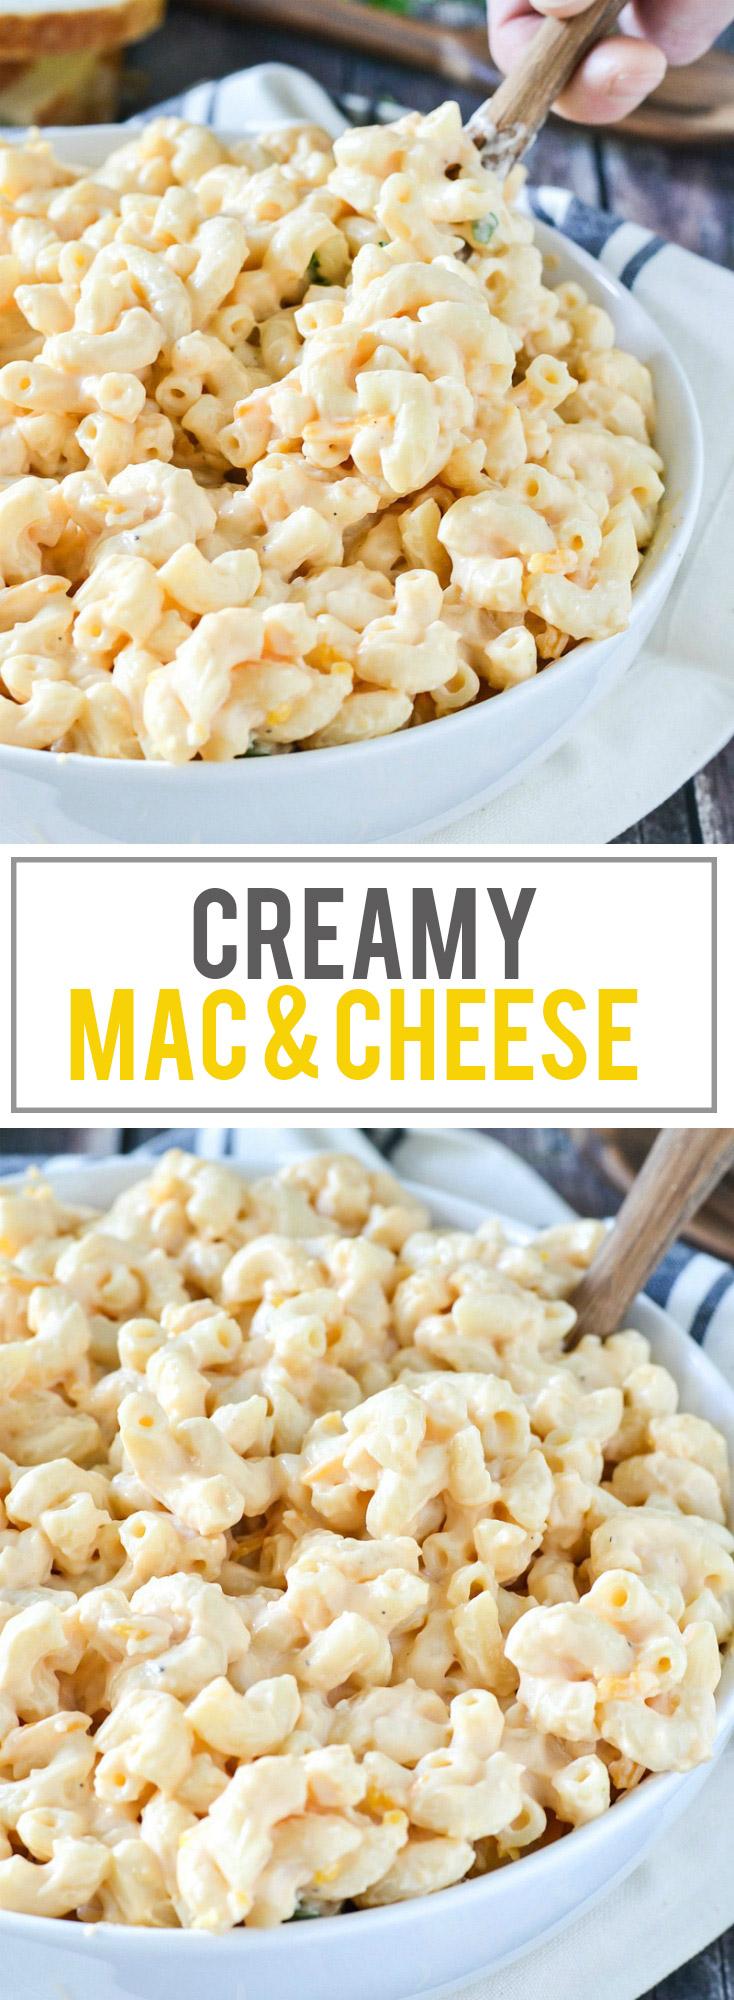 Creamy Macaroni and Cheese | www.motherthyme.com